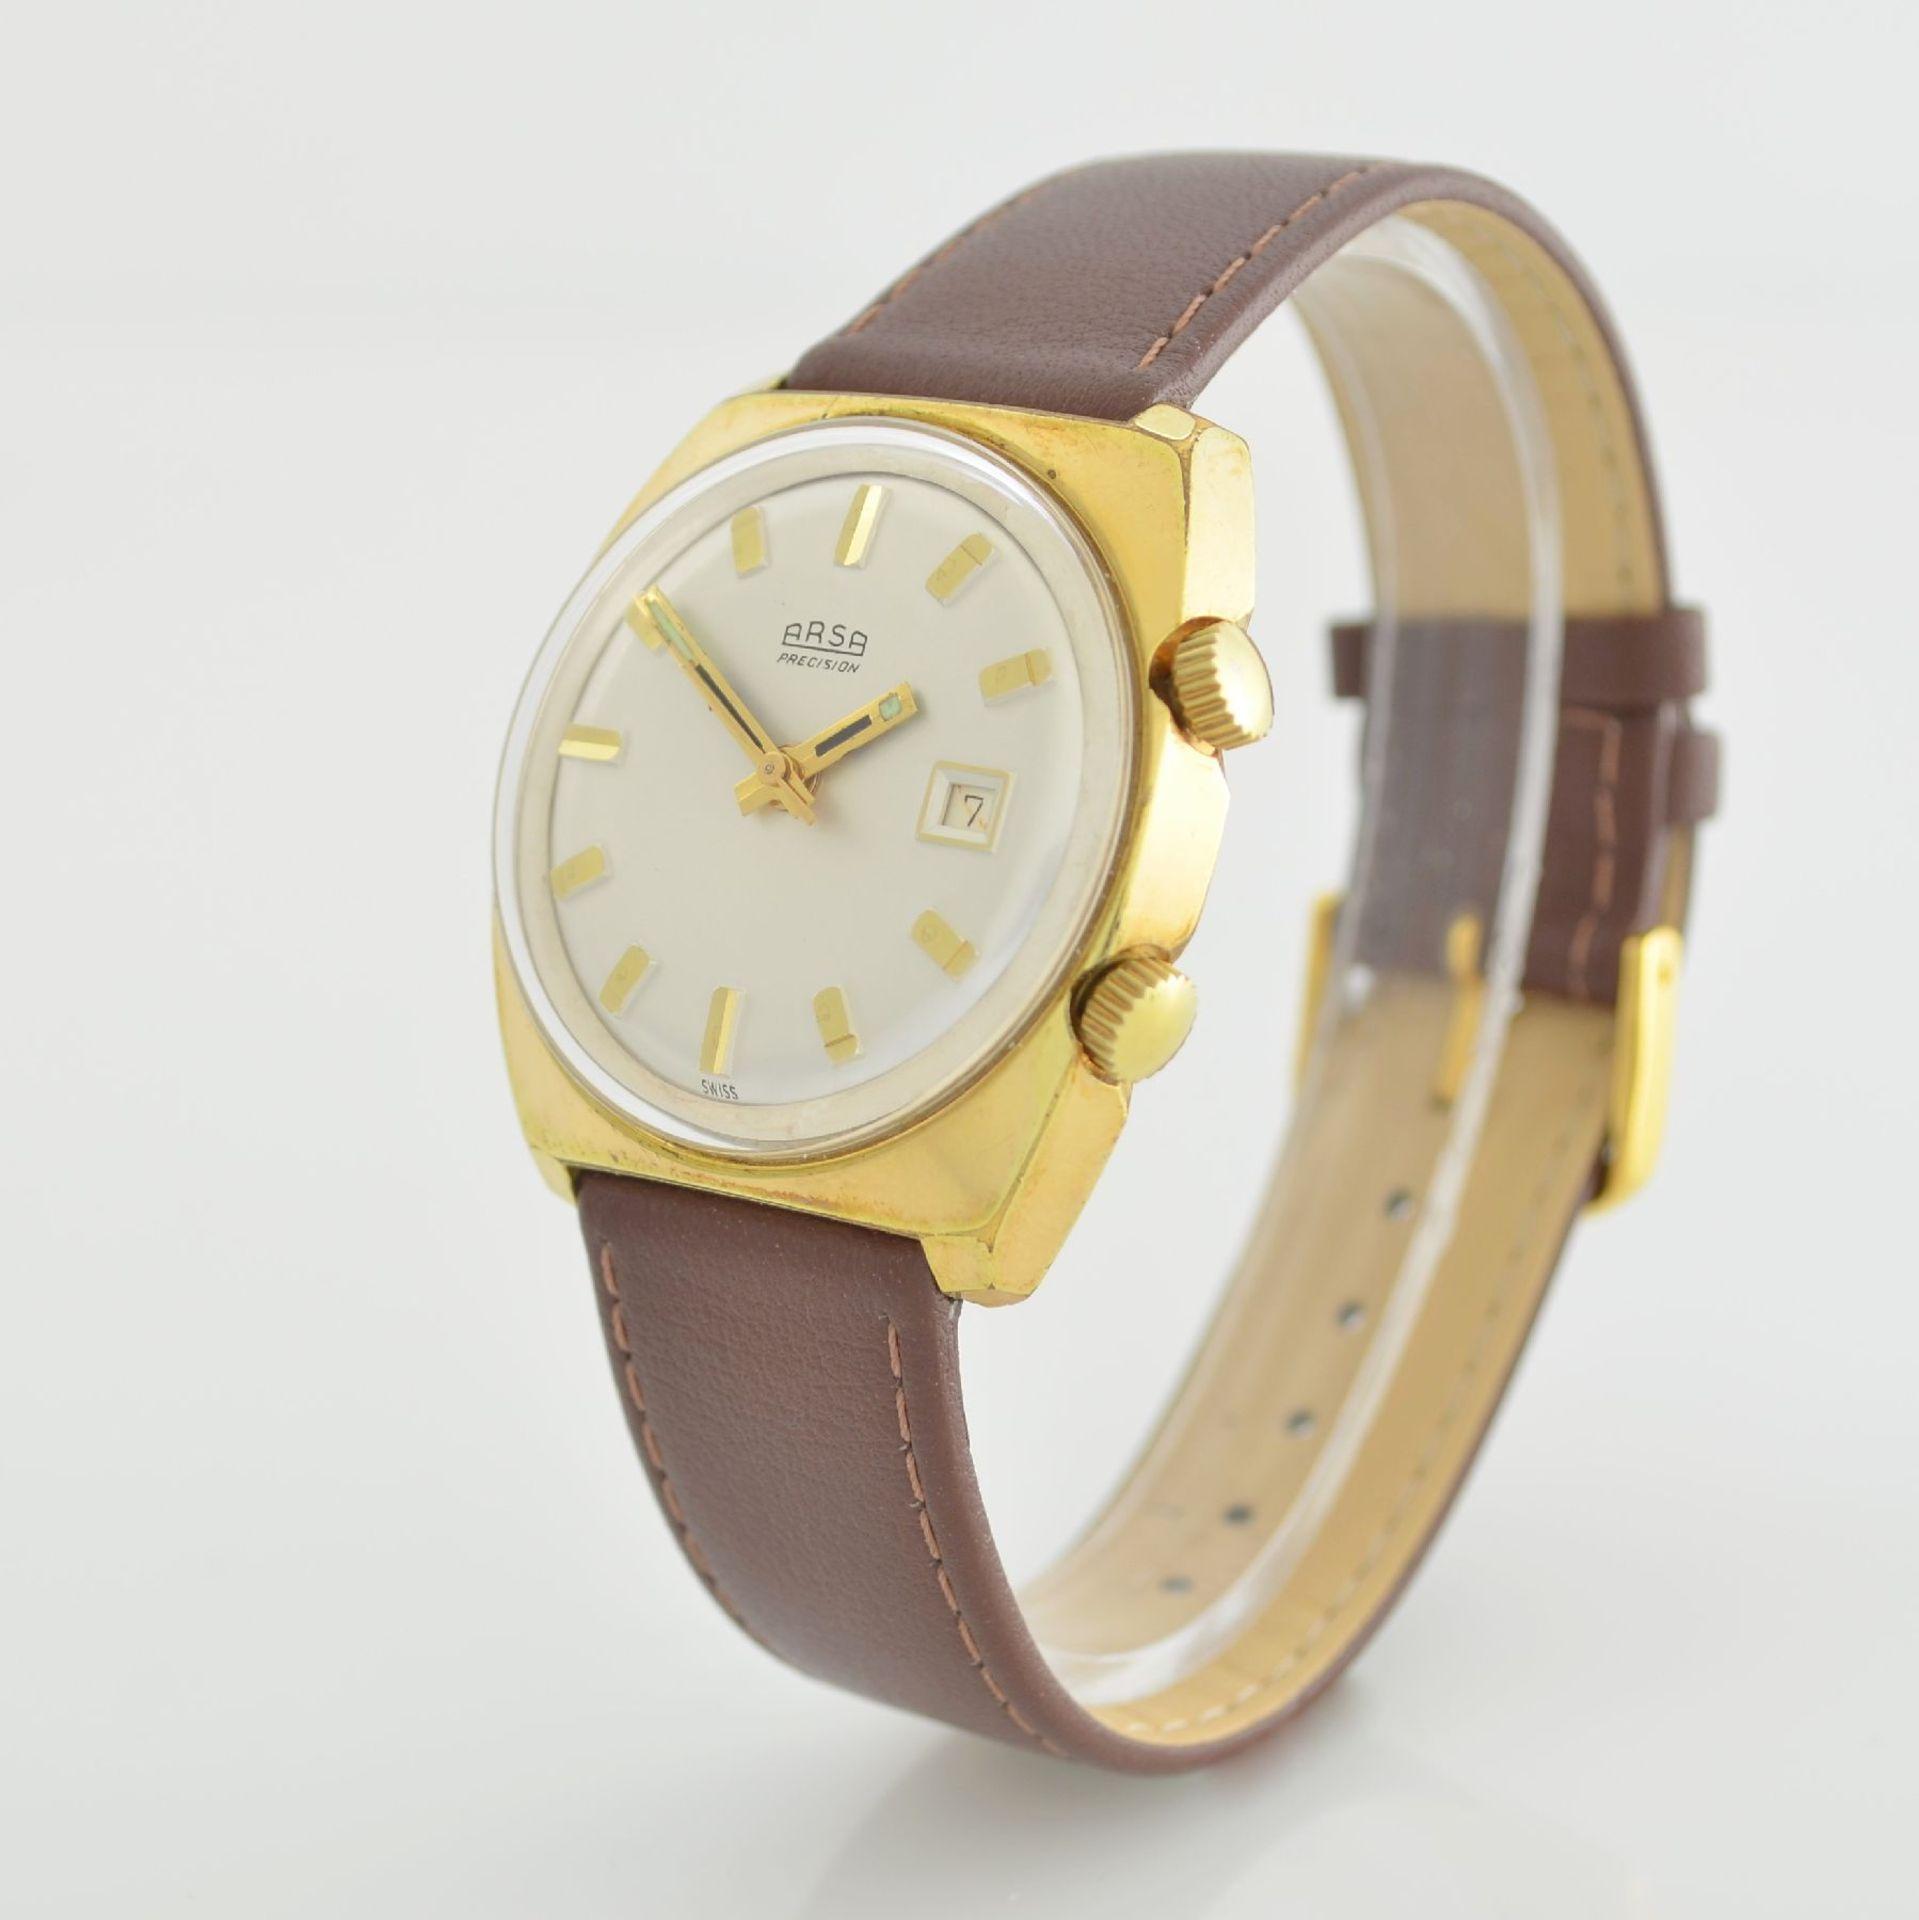 Konvolut: 2 Armbanduhren, beide Schweiz um 1970, beide Metall verg., 1 x Arsa Armbandwecker, Boden - Bild 3 aus 12